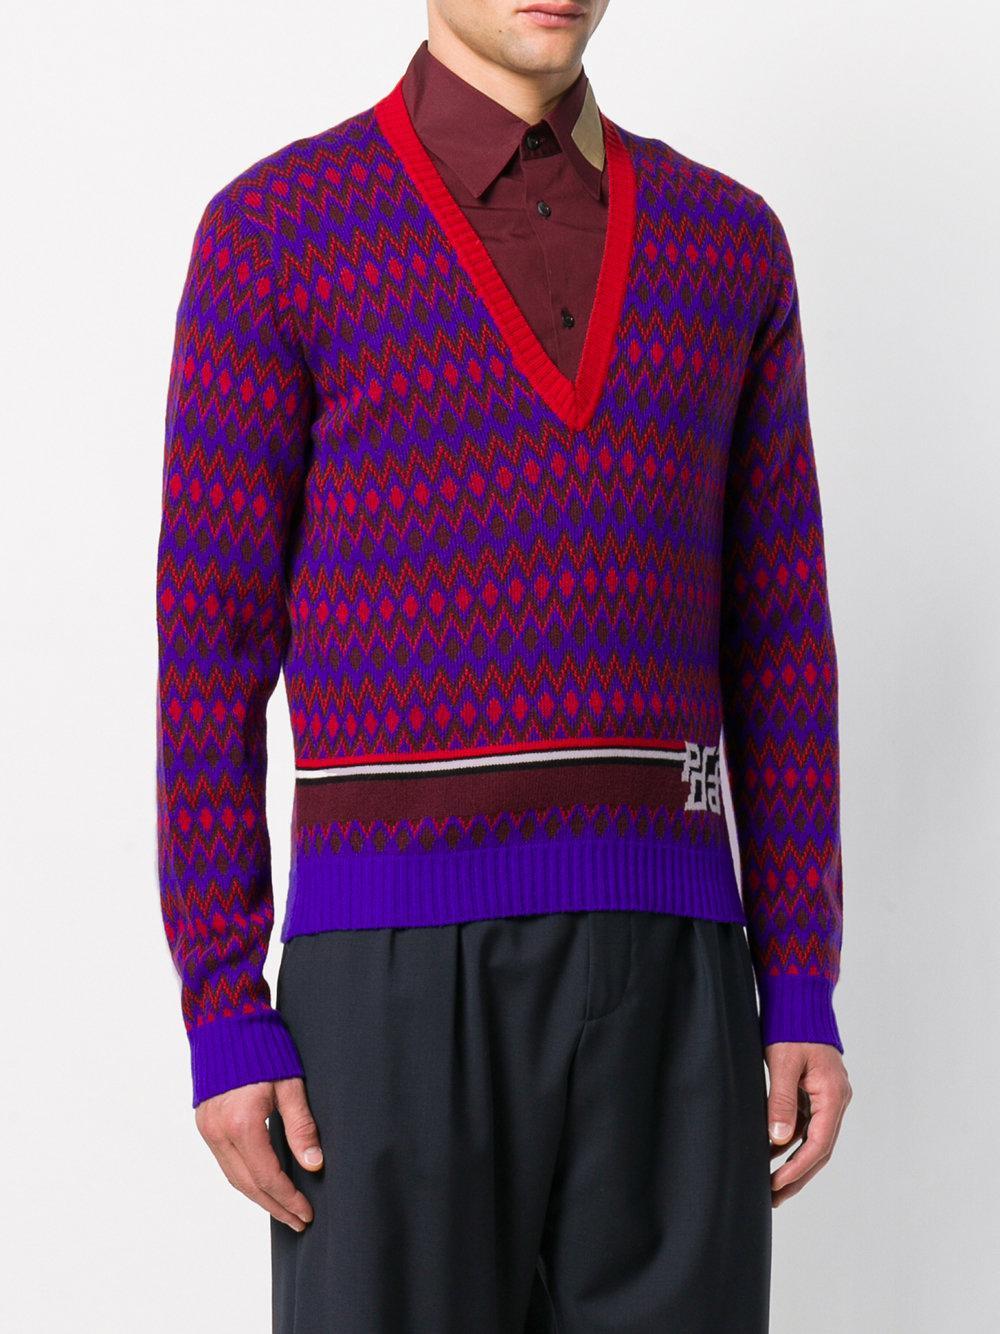 8d4a956b8 Lyst - Prada V-neck Intarsia Logo Sweater in Blue for Men